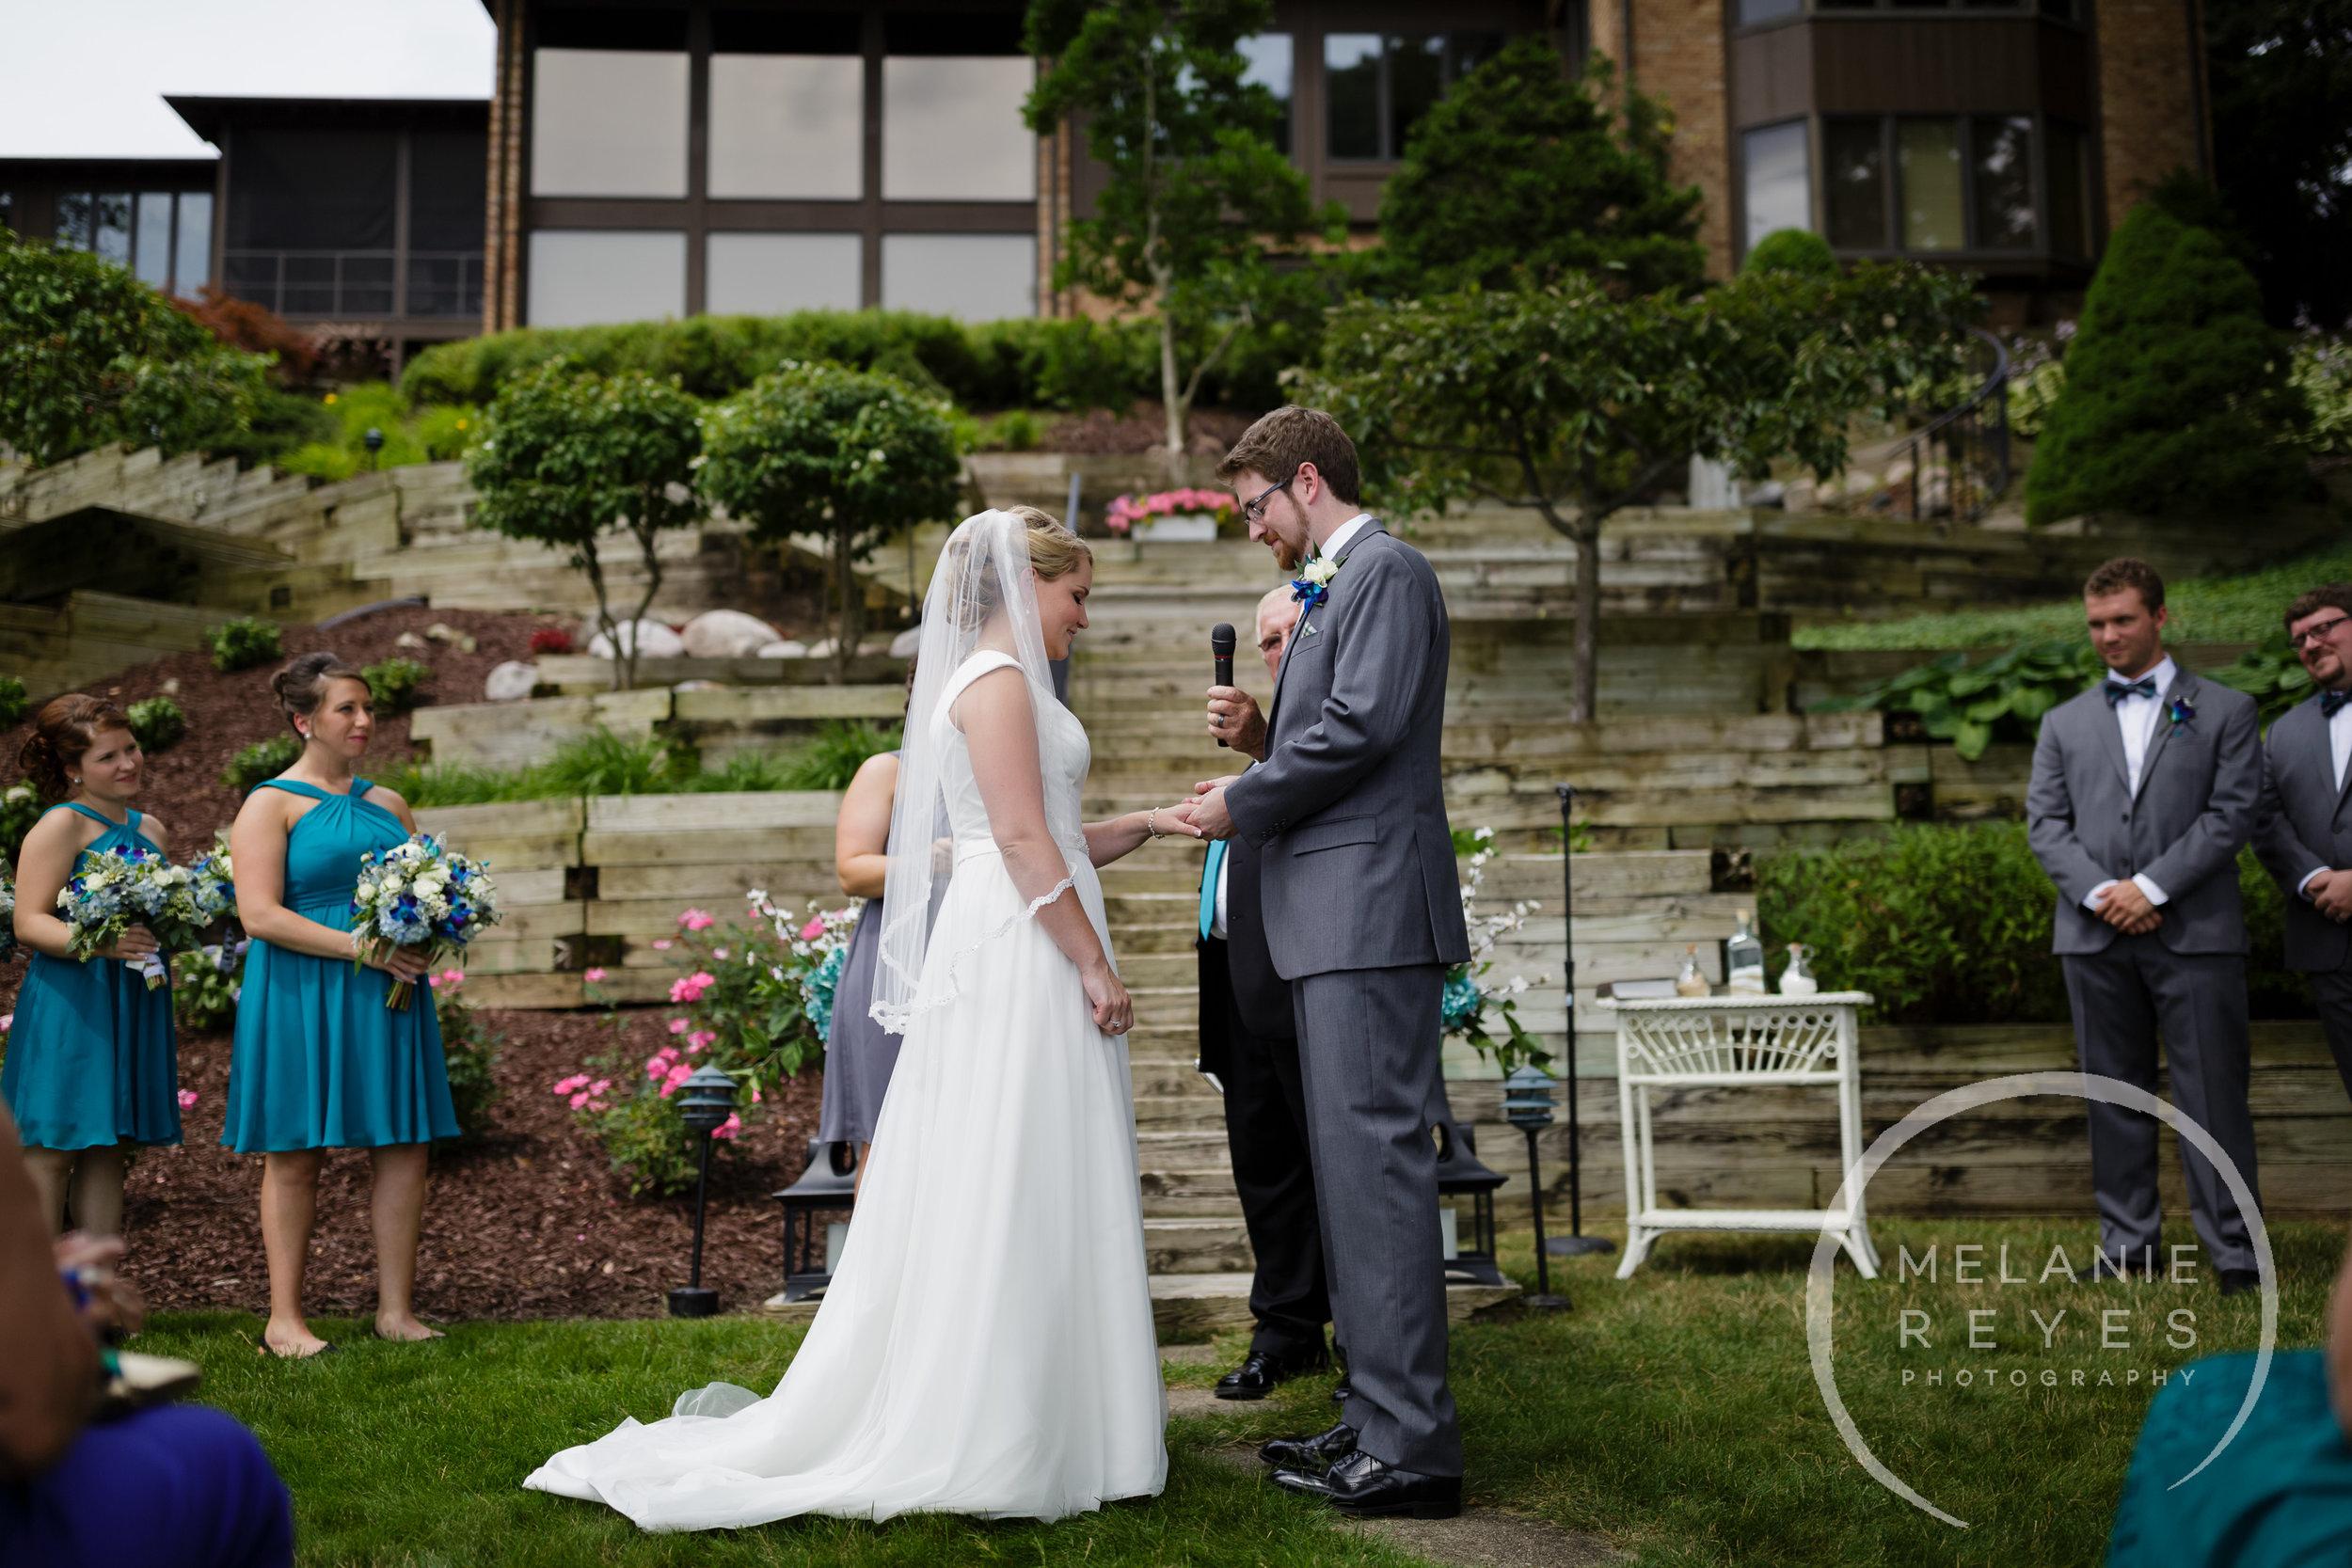 027_grandrapids_wedding_photographer_melaniereyes.JPG